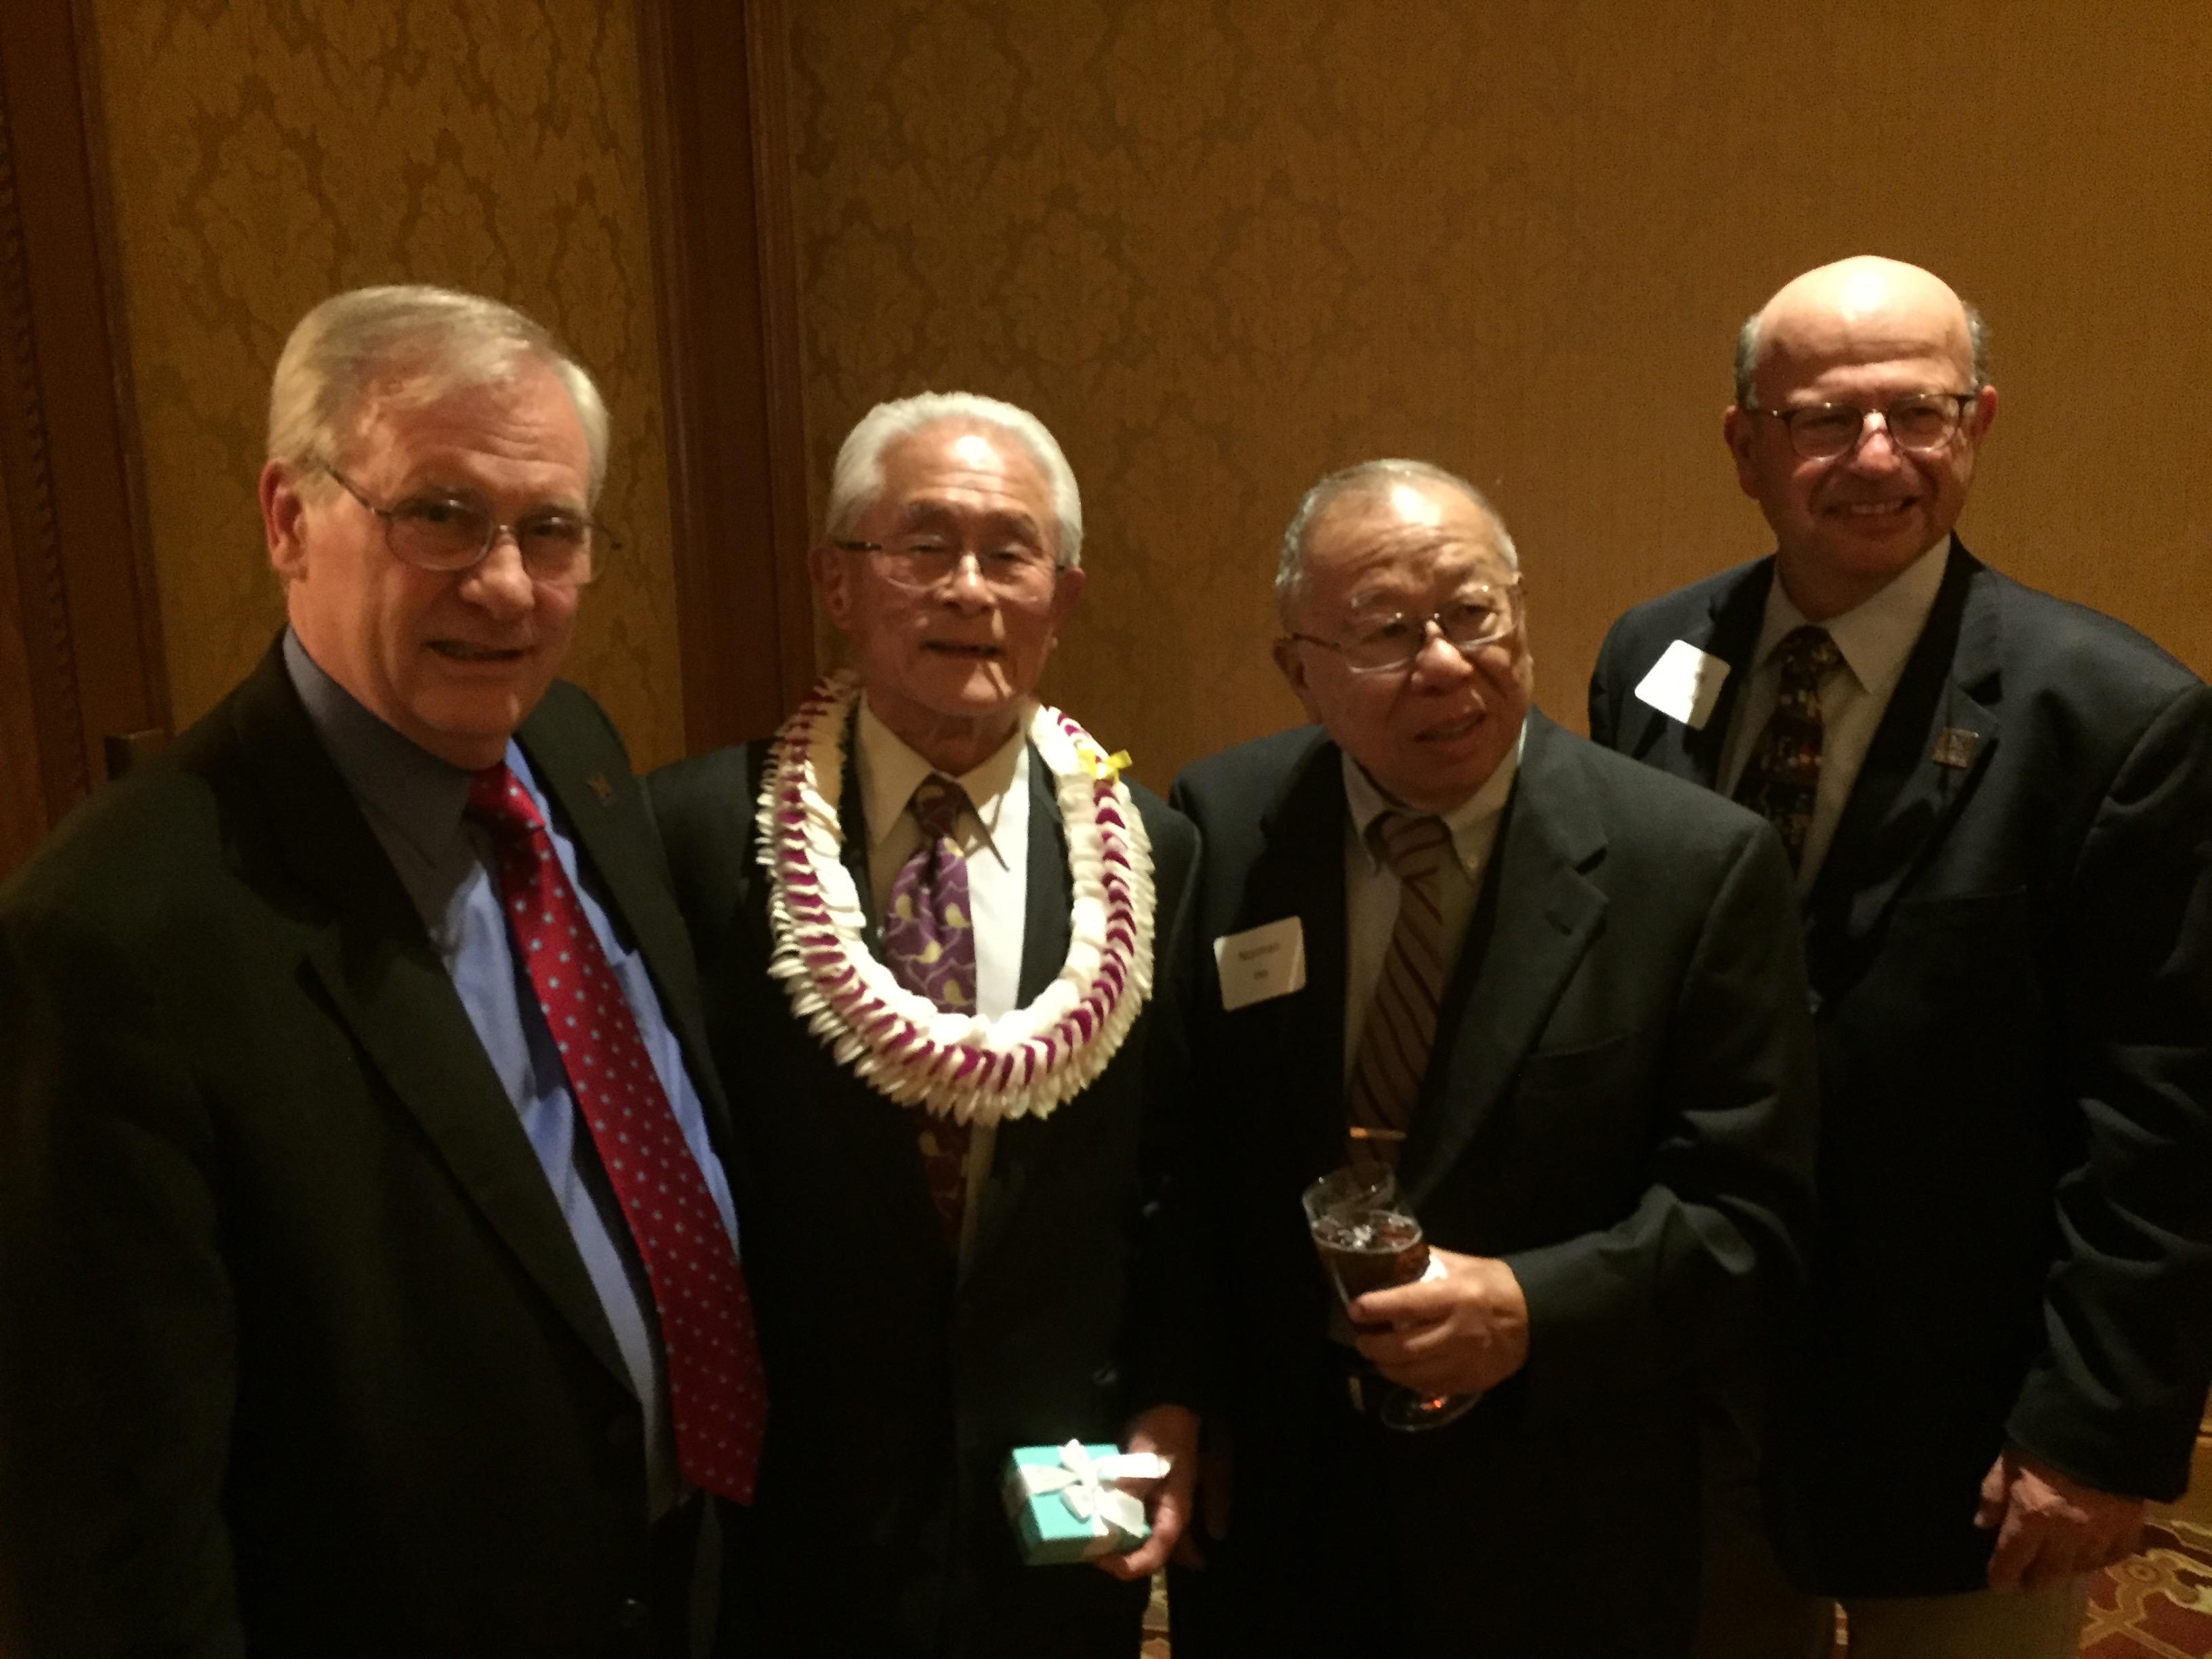 Gordon Amidon, William Higuchi, Norman Ho, and Frank Ascione at Dr. Higuchi's 85th birthday party.